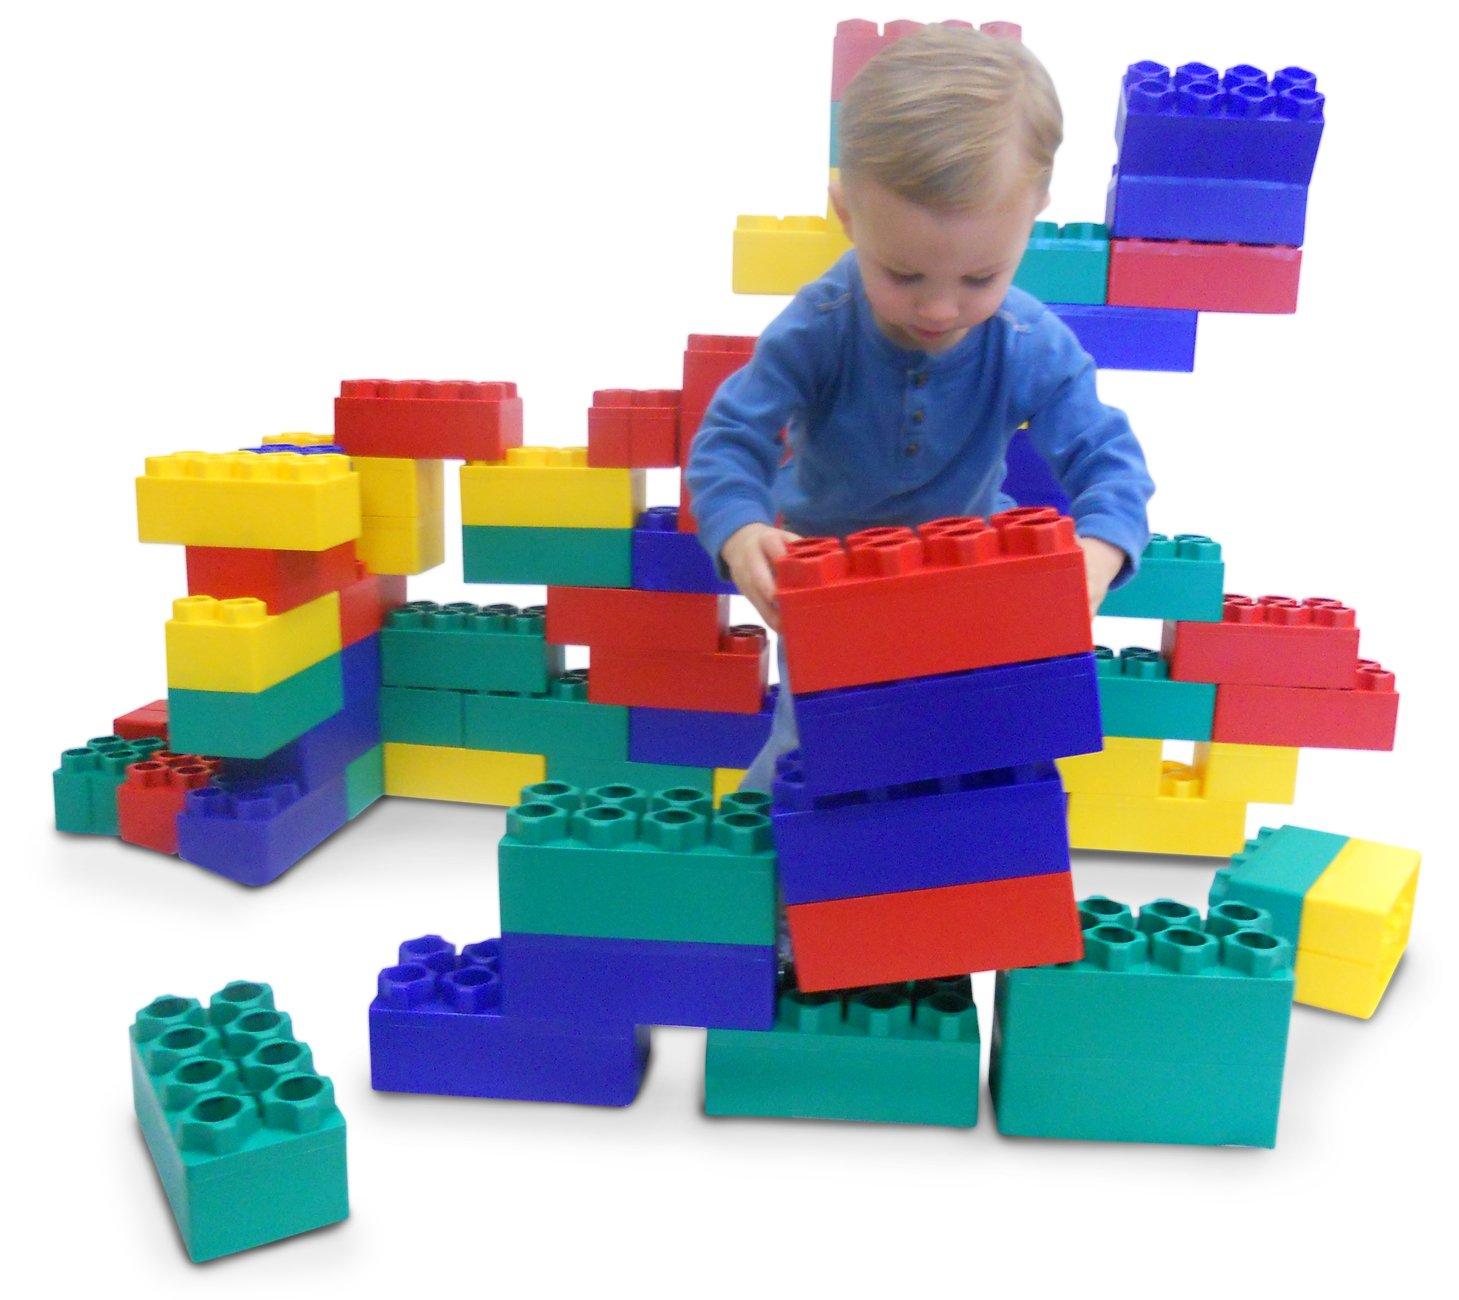 Kids Adventure Jumbo Blocks 24 piece - Kids Krate Toys